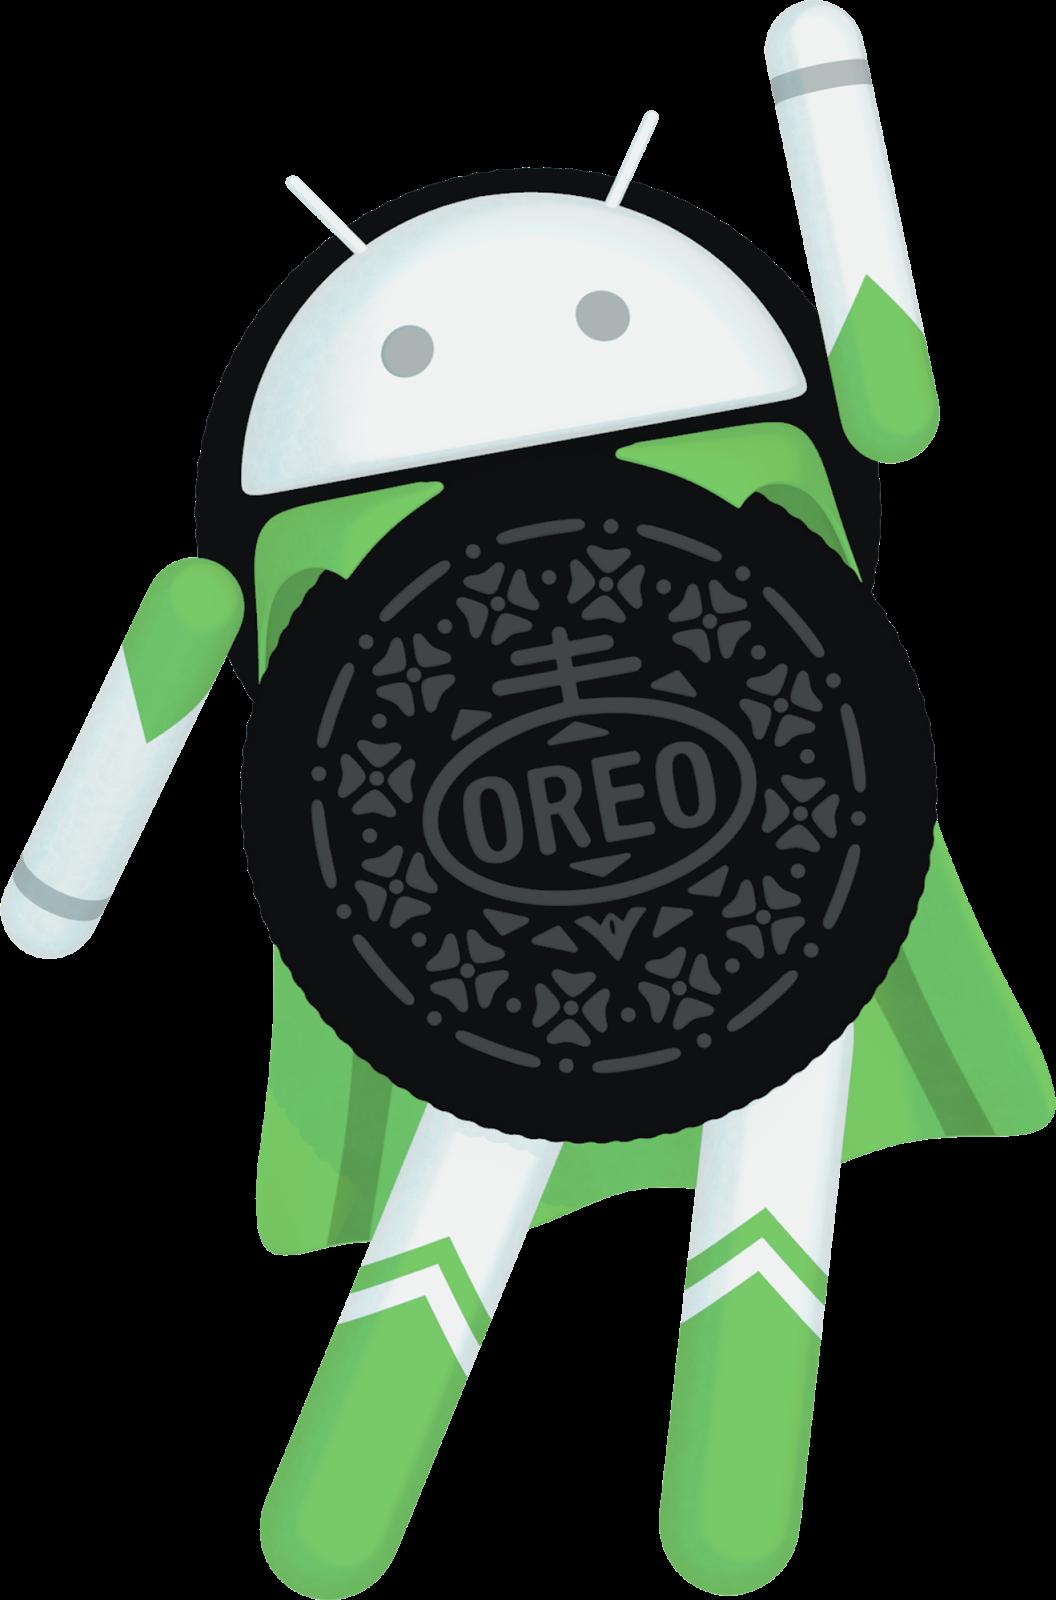 AndroidOreo